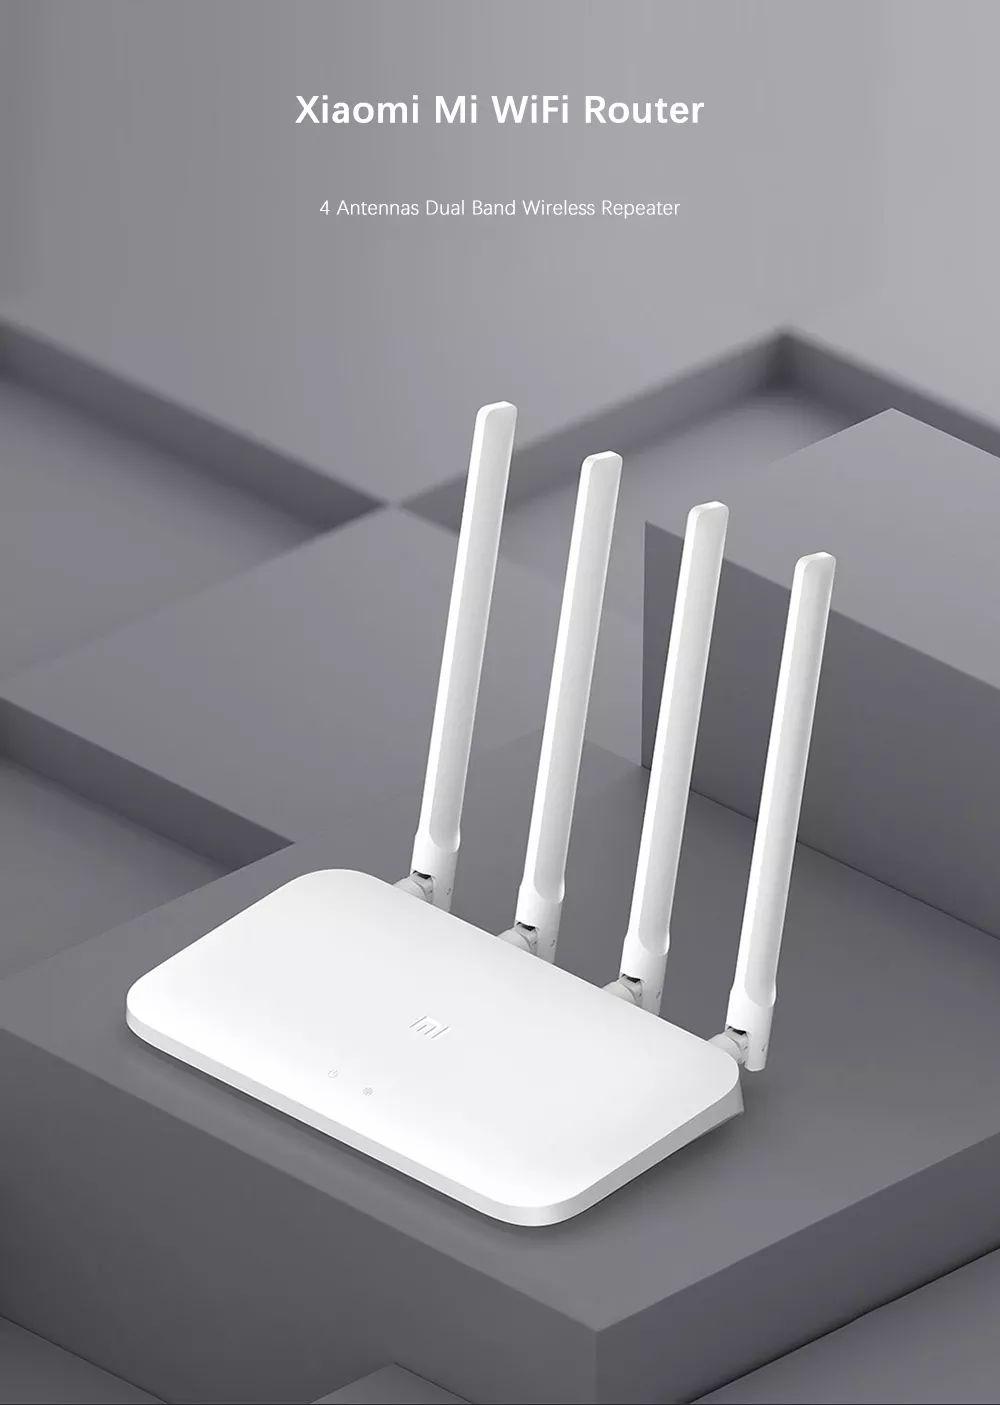 Xiaomi Mi Router 4a Dual Band With 4 Antennas (1)